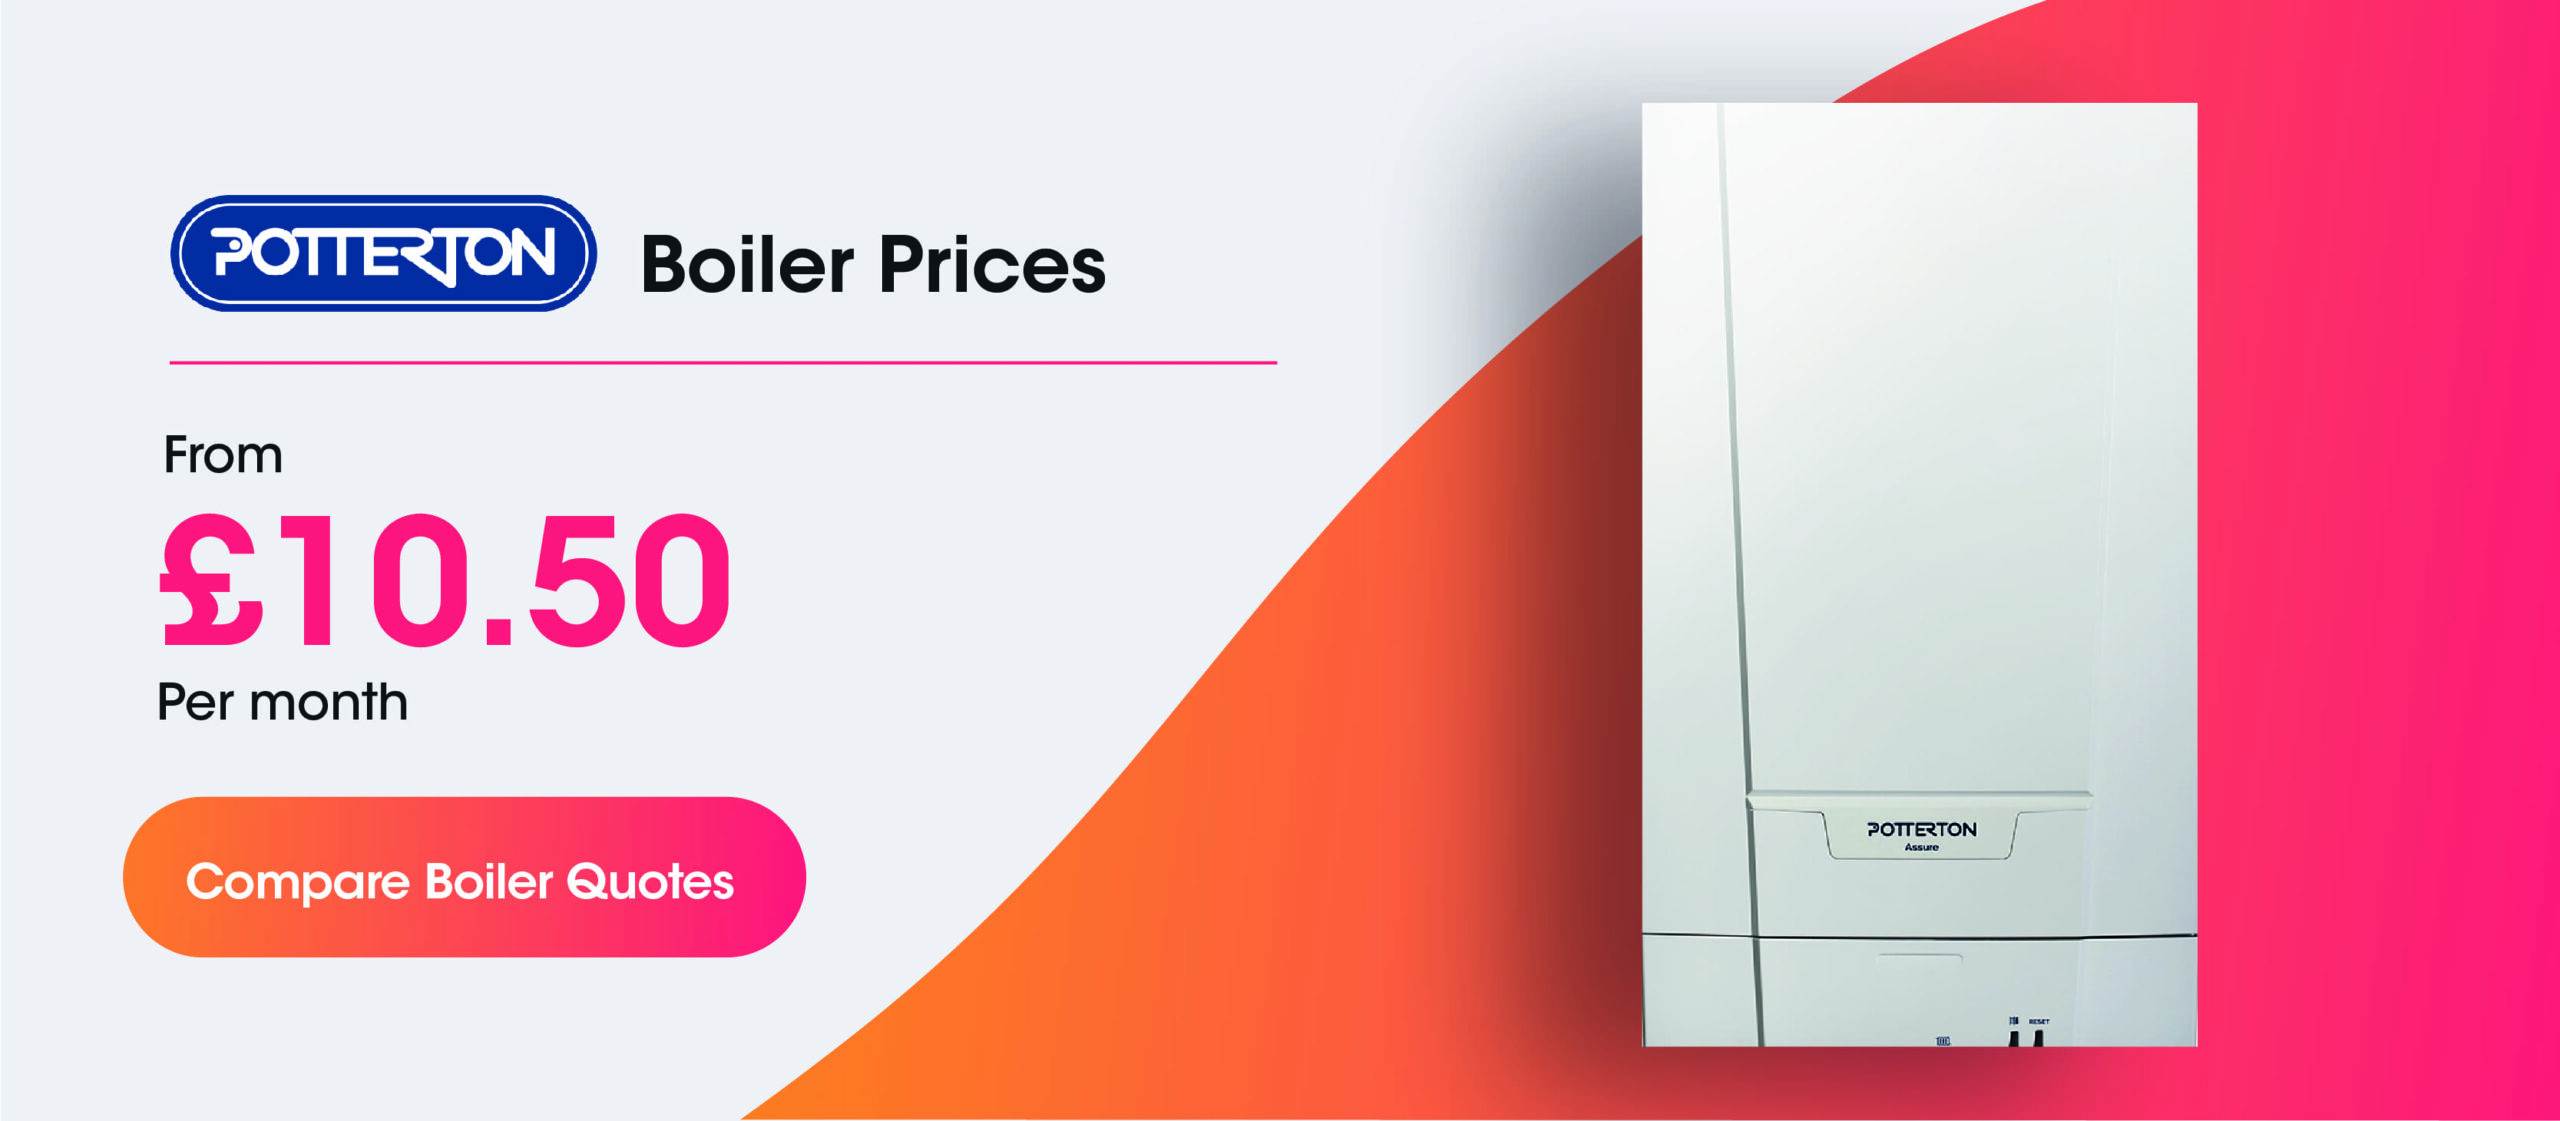 Potterton Boiler Prices & Review Compare Boiler Quotes